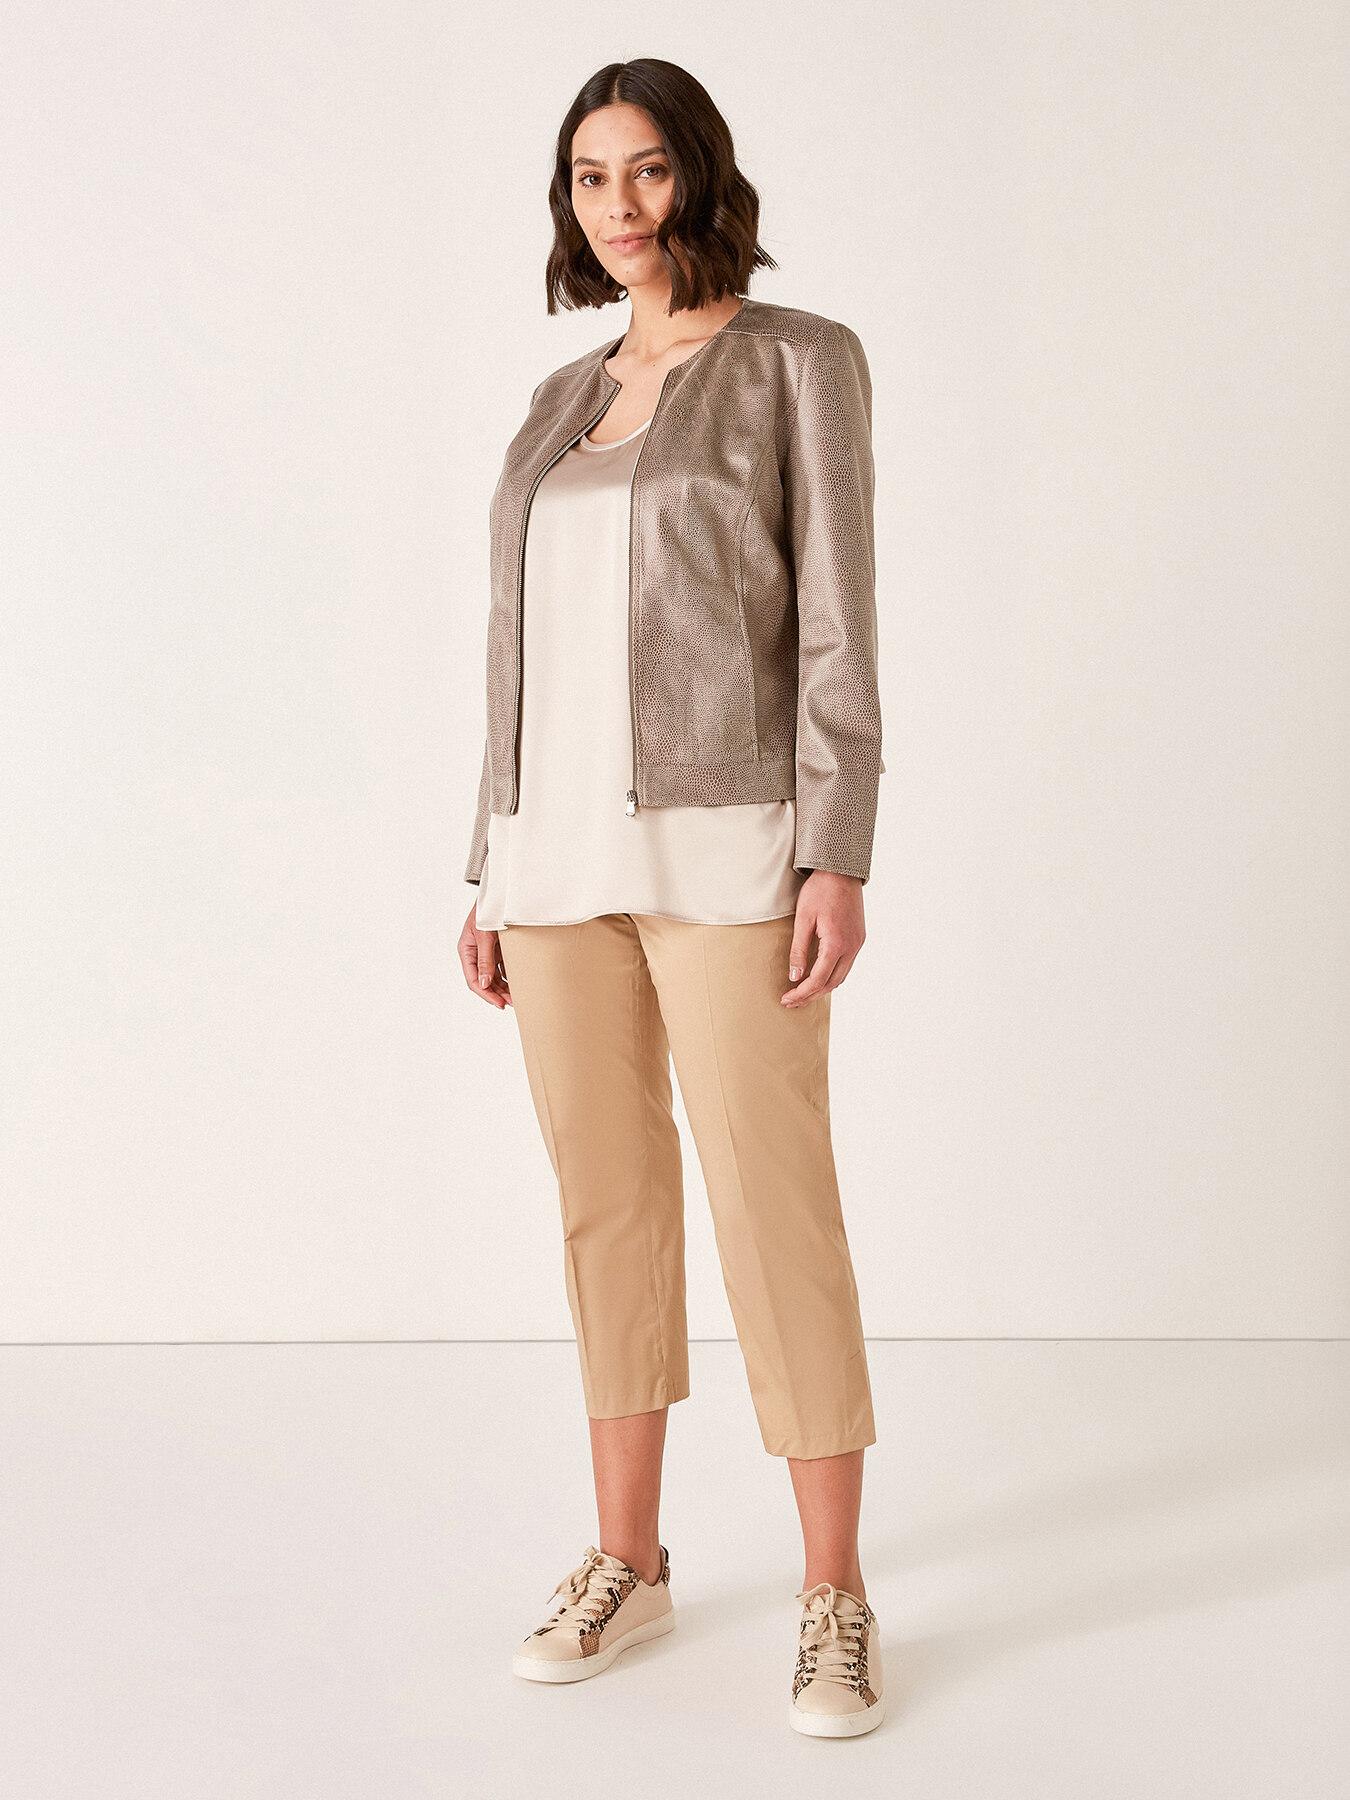 ELENA MIRO' | Trousers Conformed | P110Y11510G2